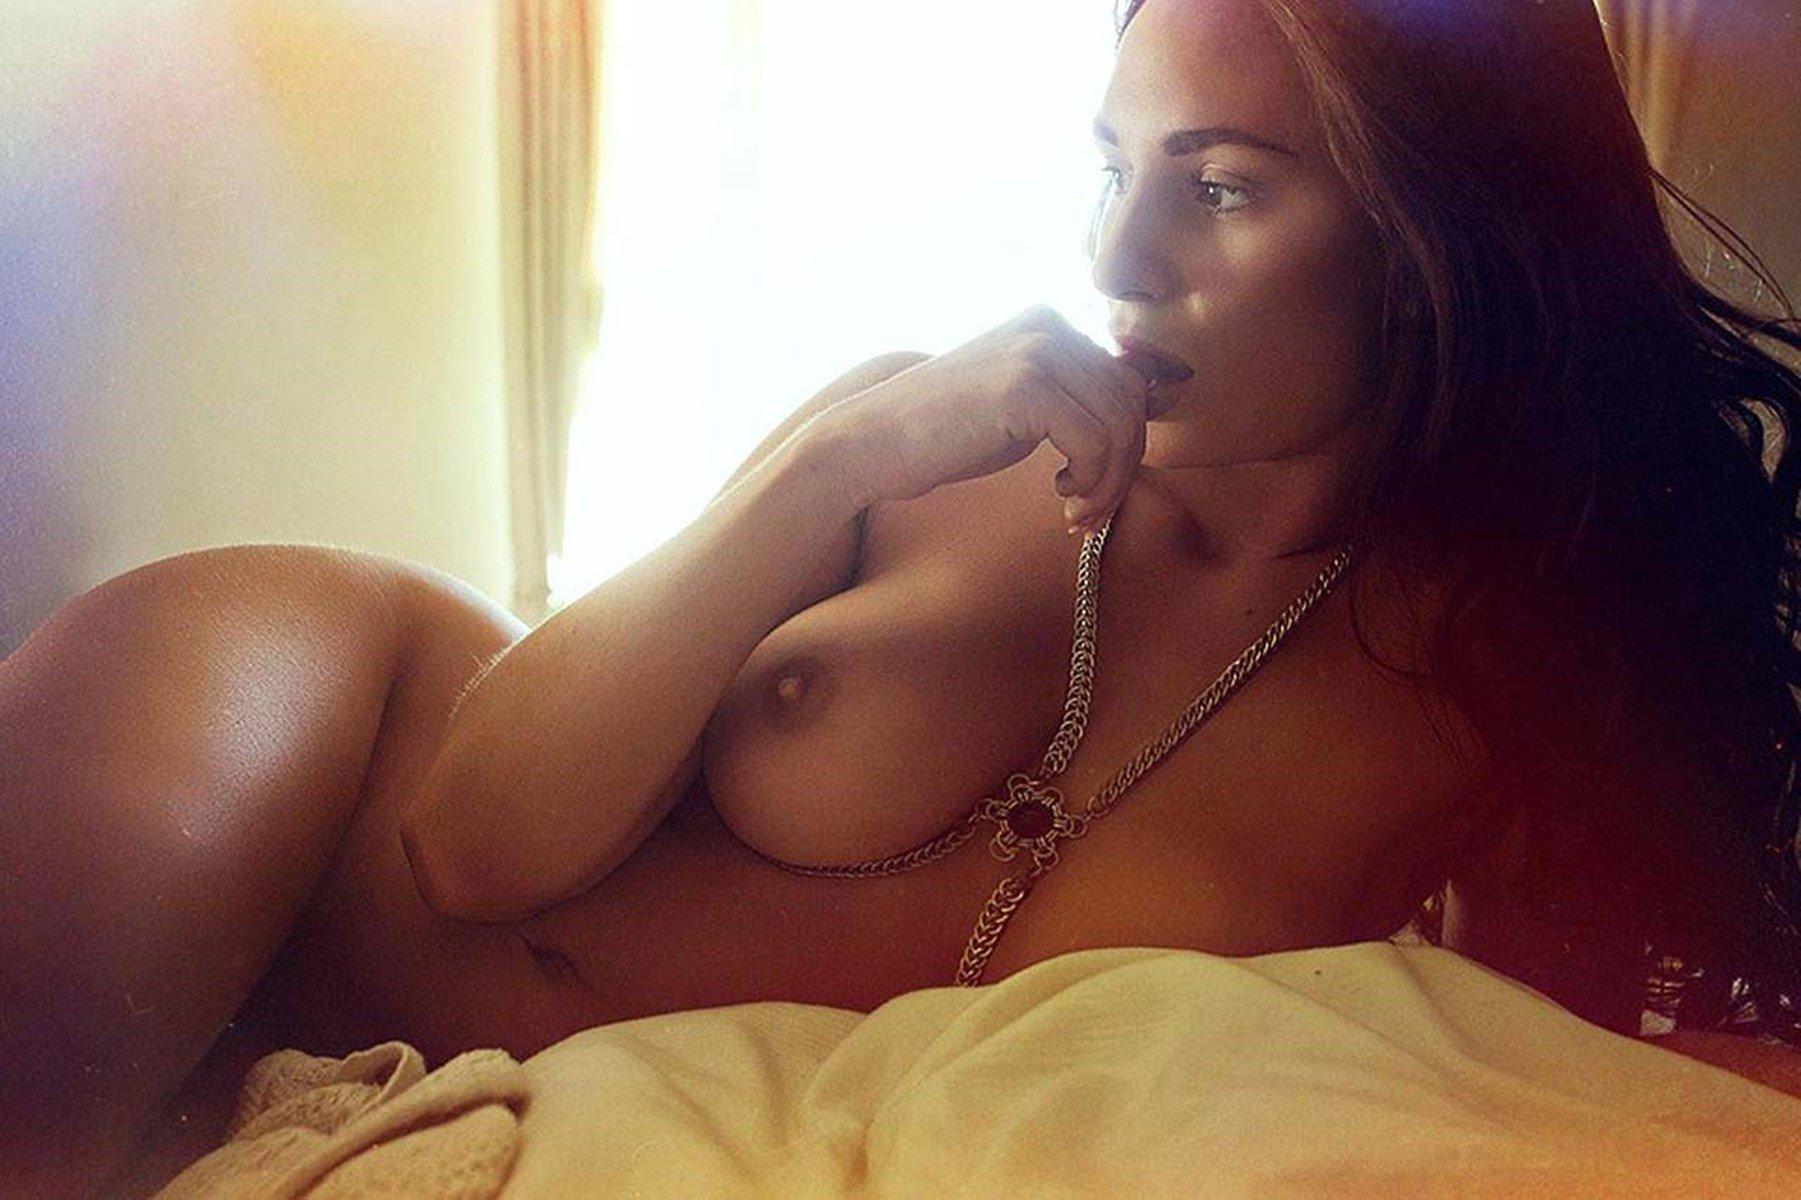 Beautiful japanese girl posts nude selfies